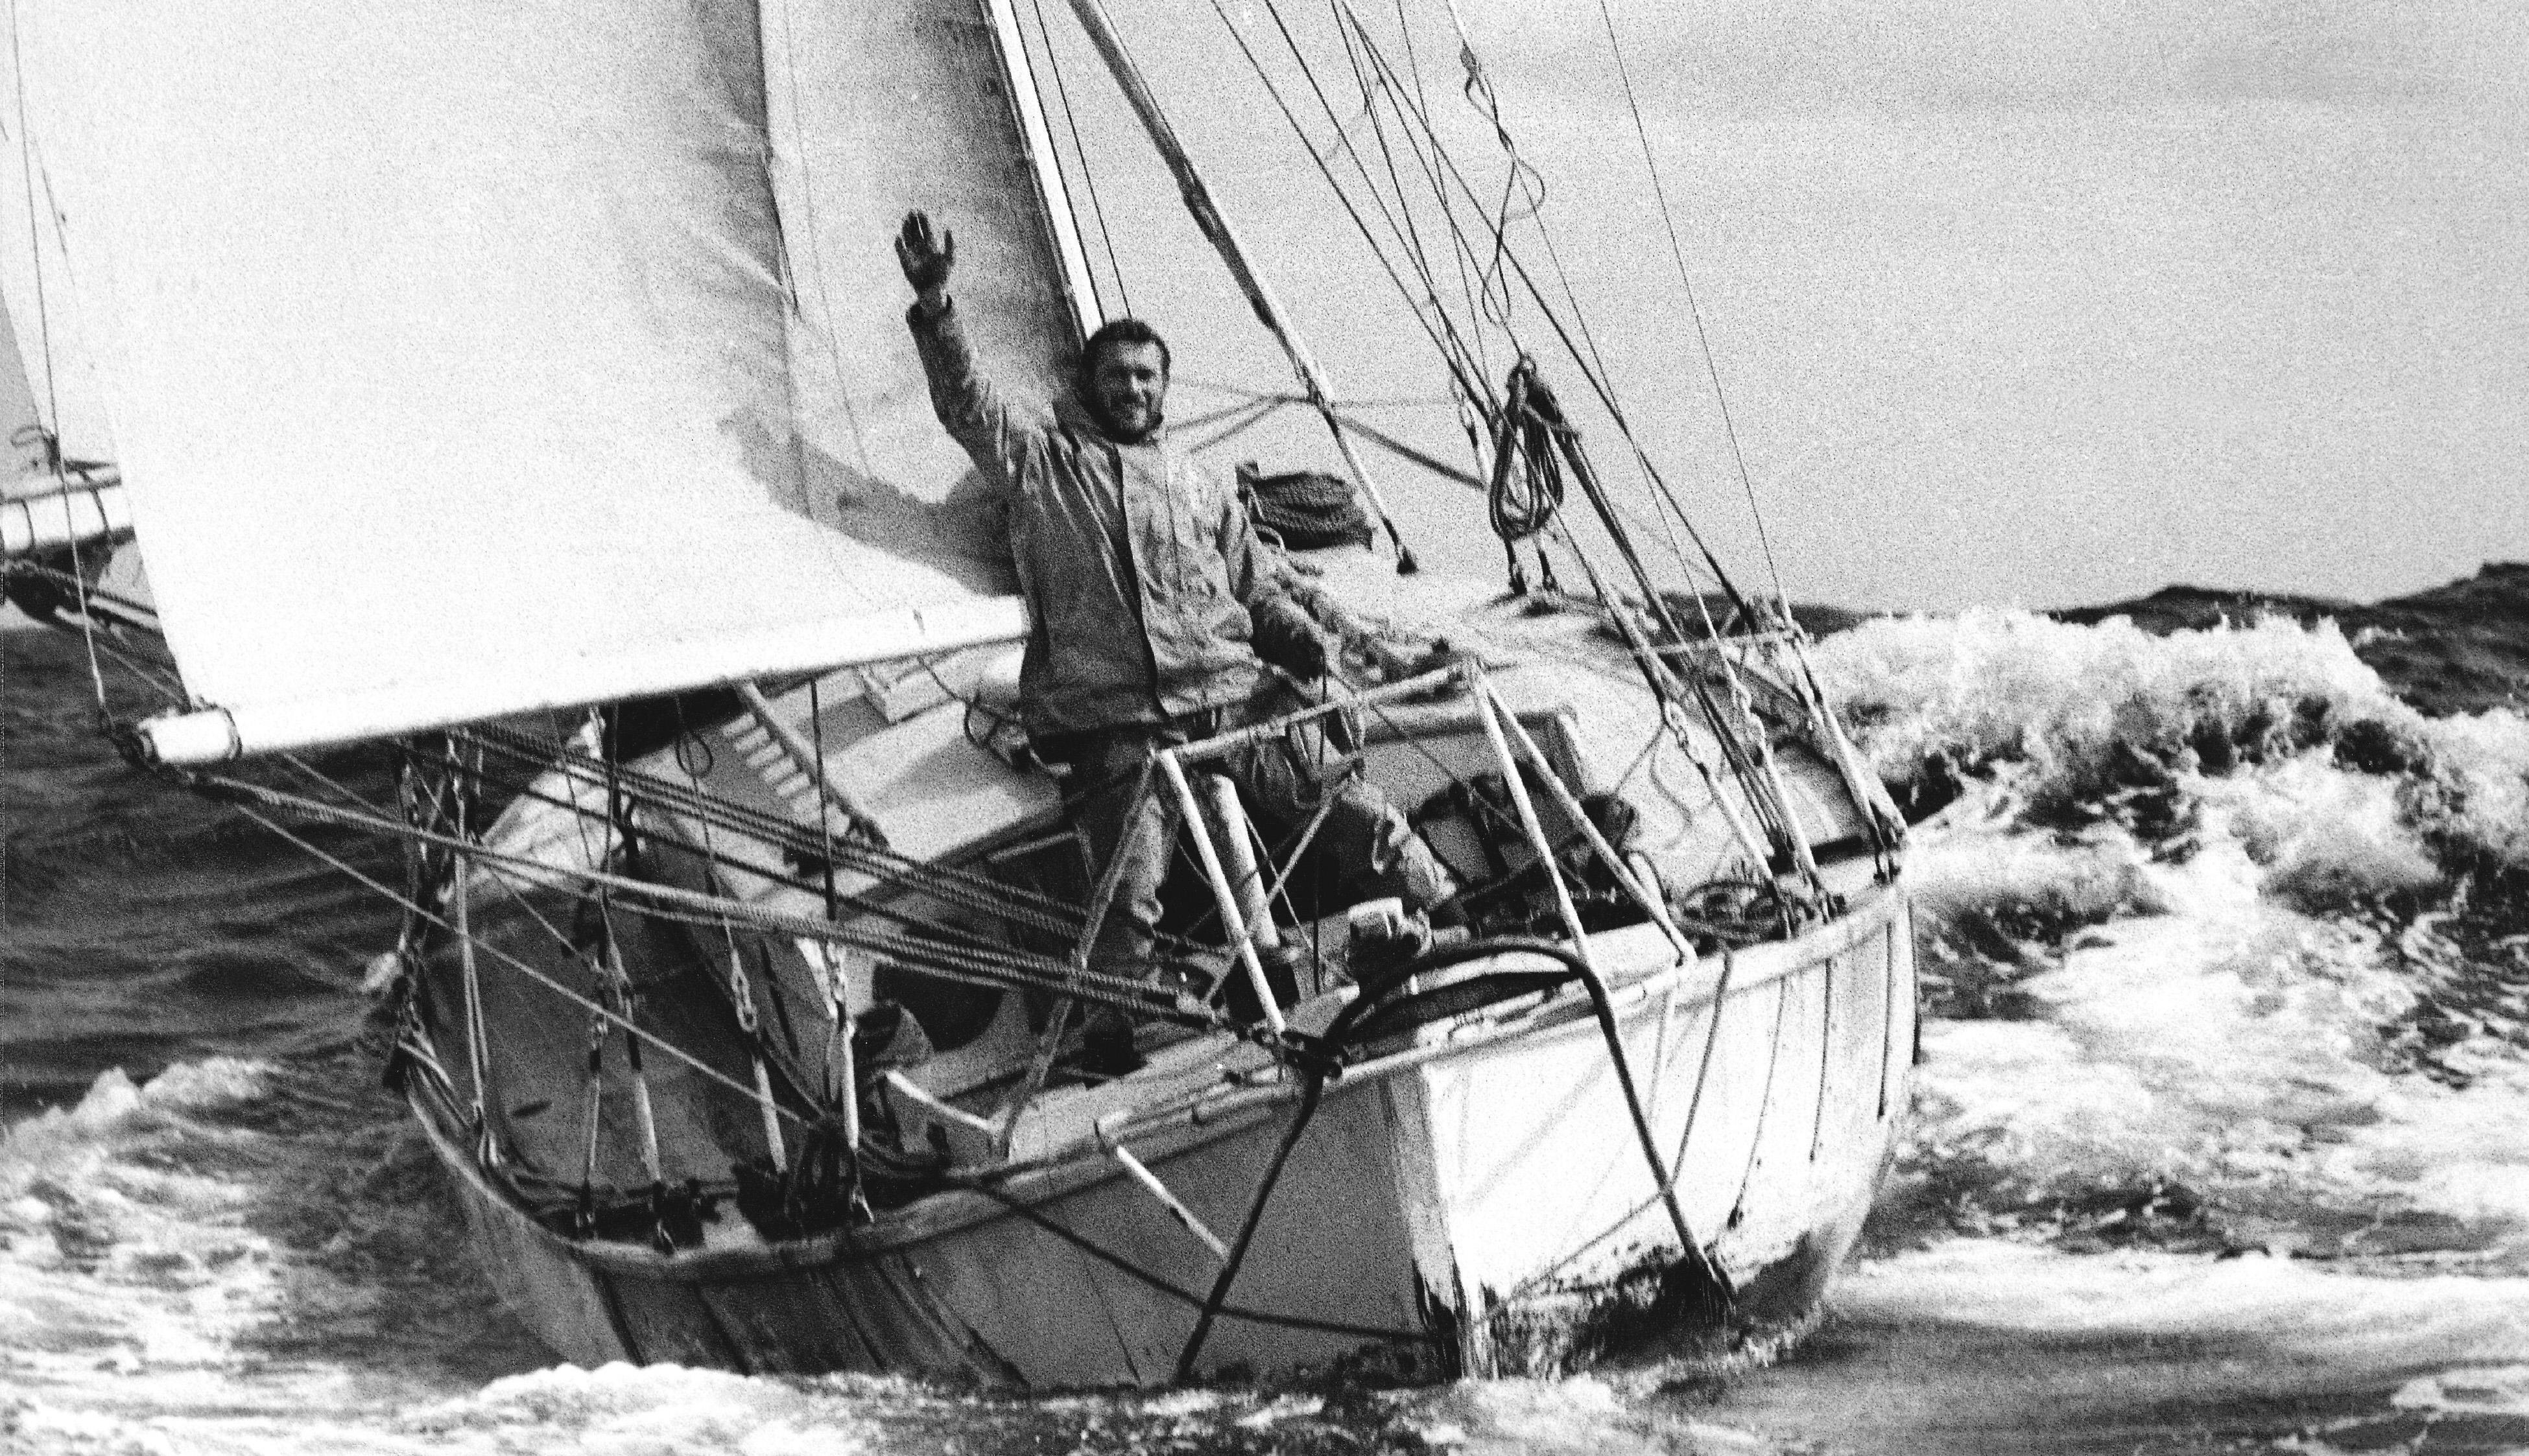 Robin Knox-Johnston sailing Suhaili during the 1968 Golden Globe Race